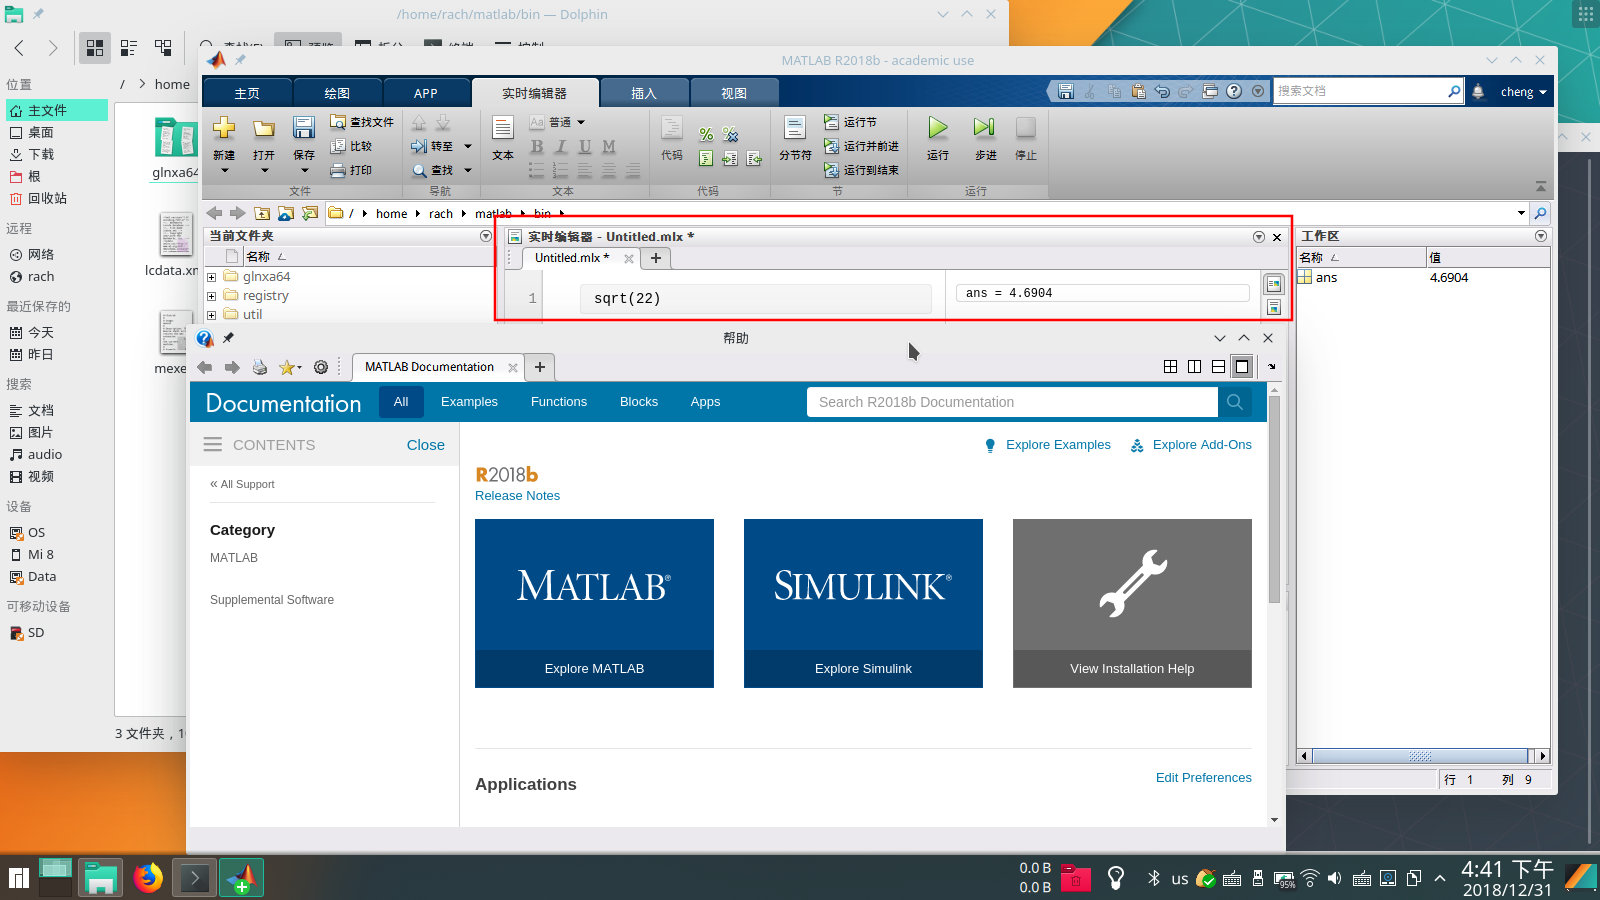 install-matlab-on-archlinux-5.jpg